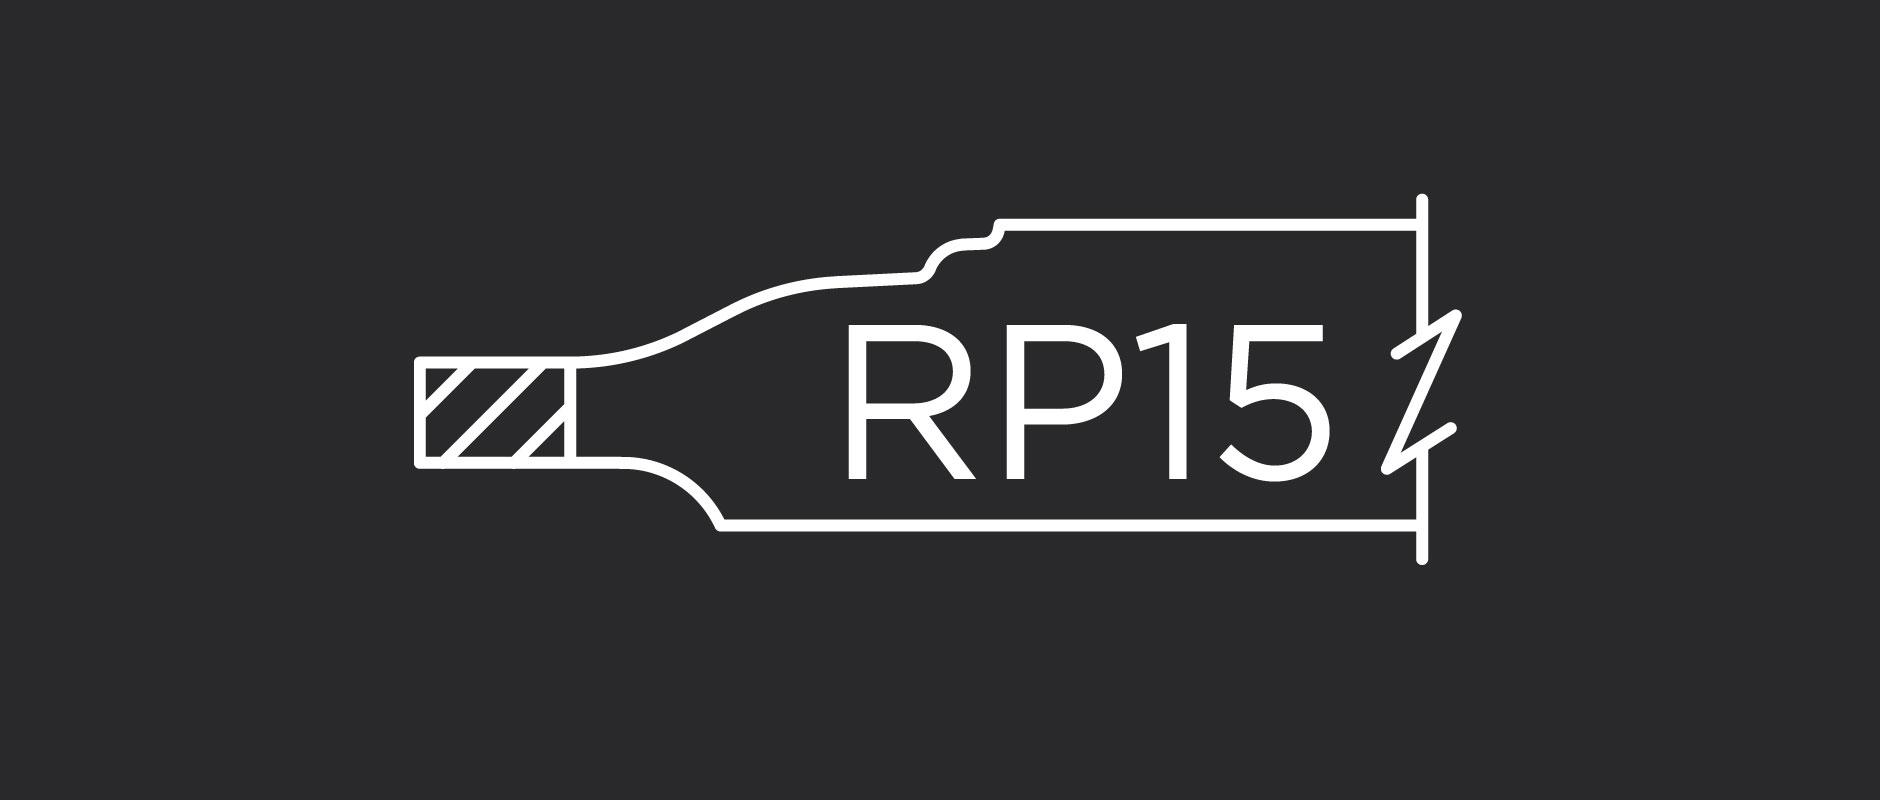 RP15 raised panel profile